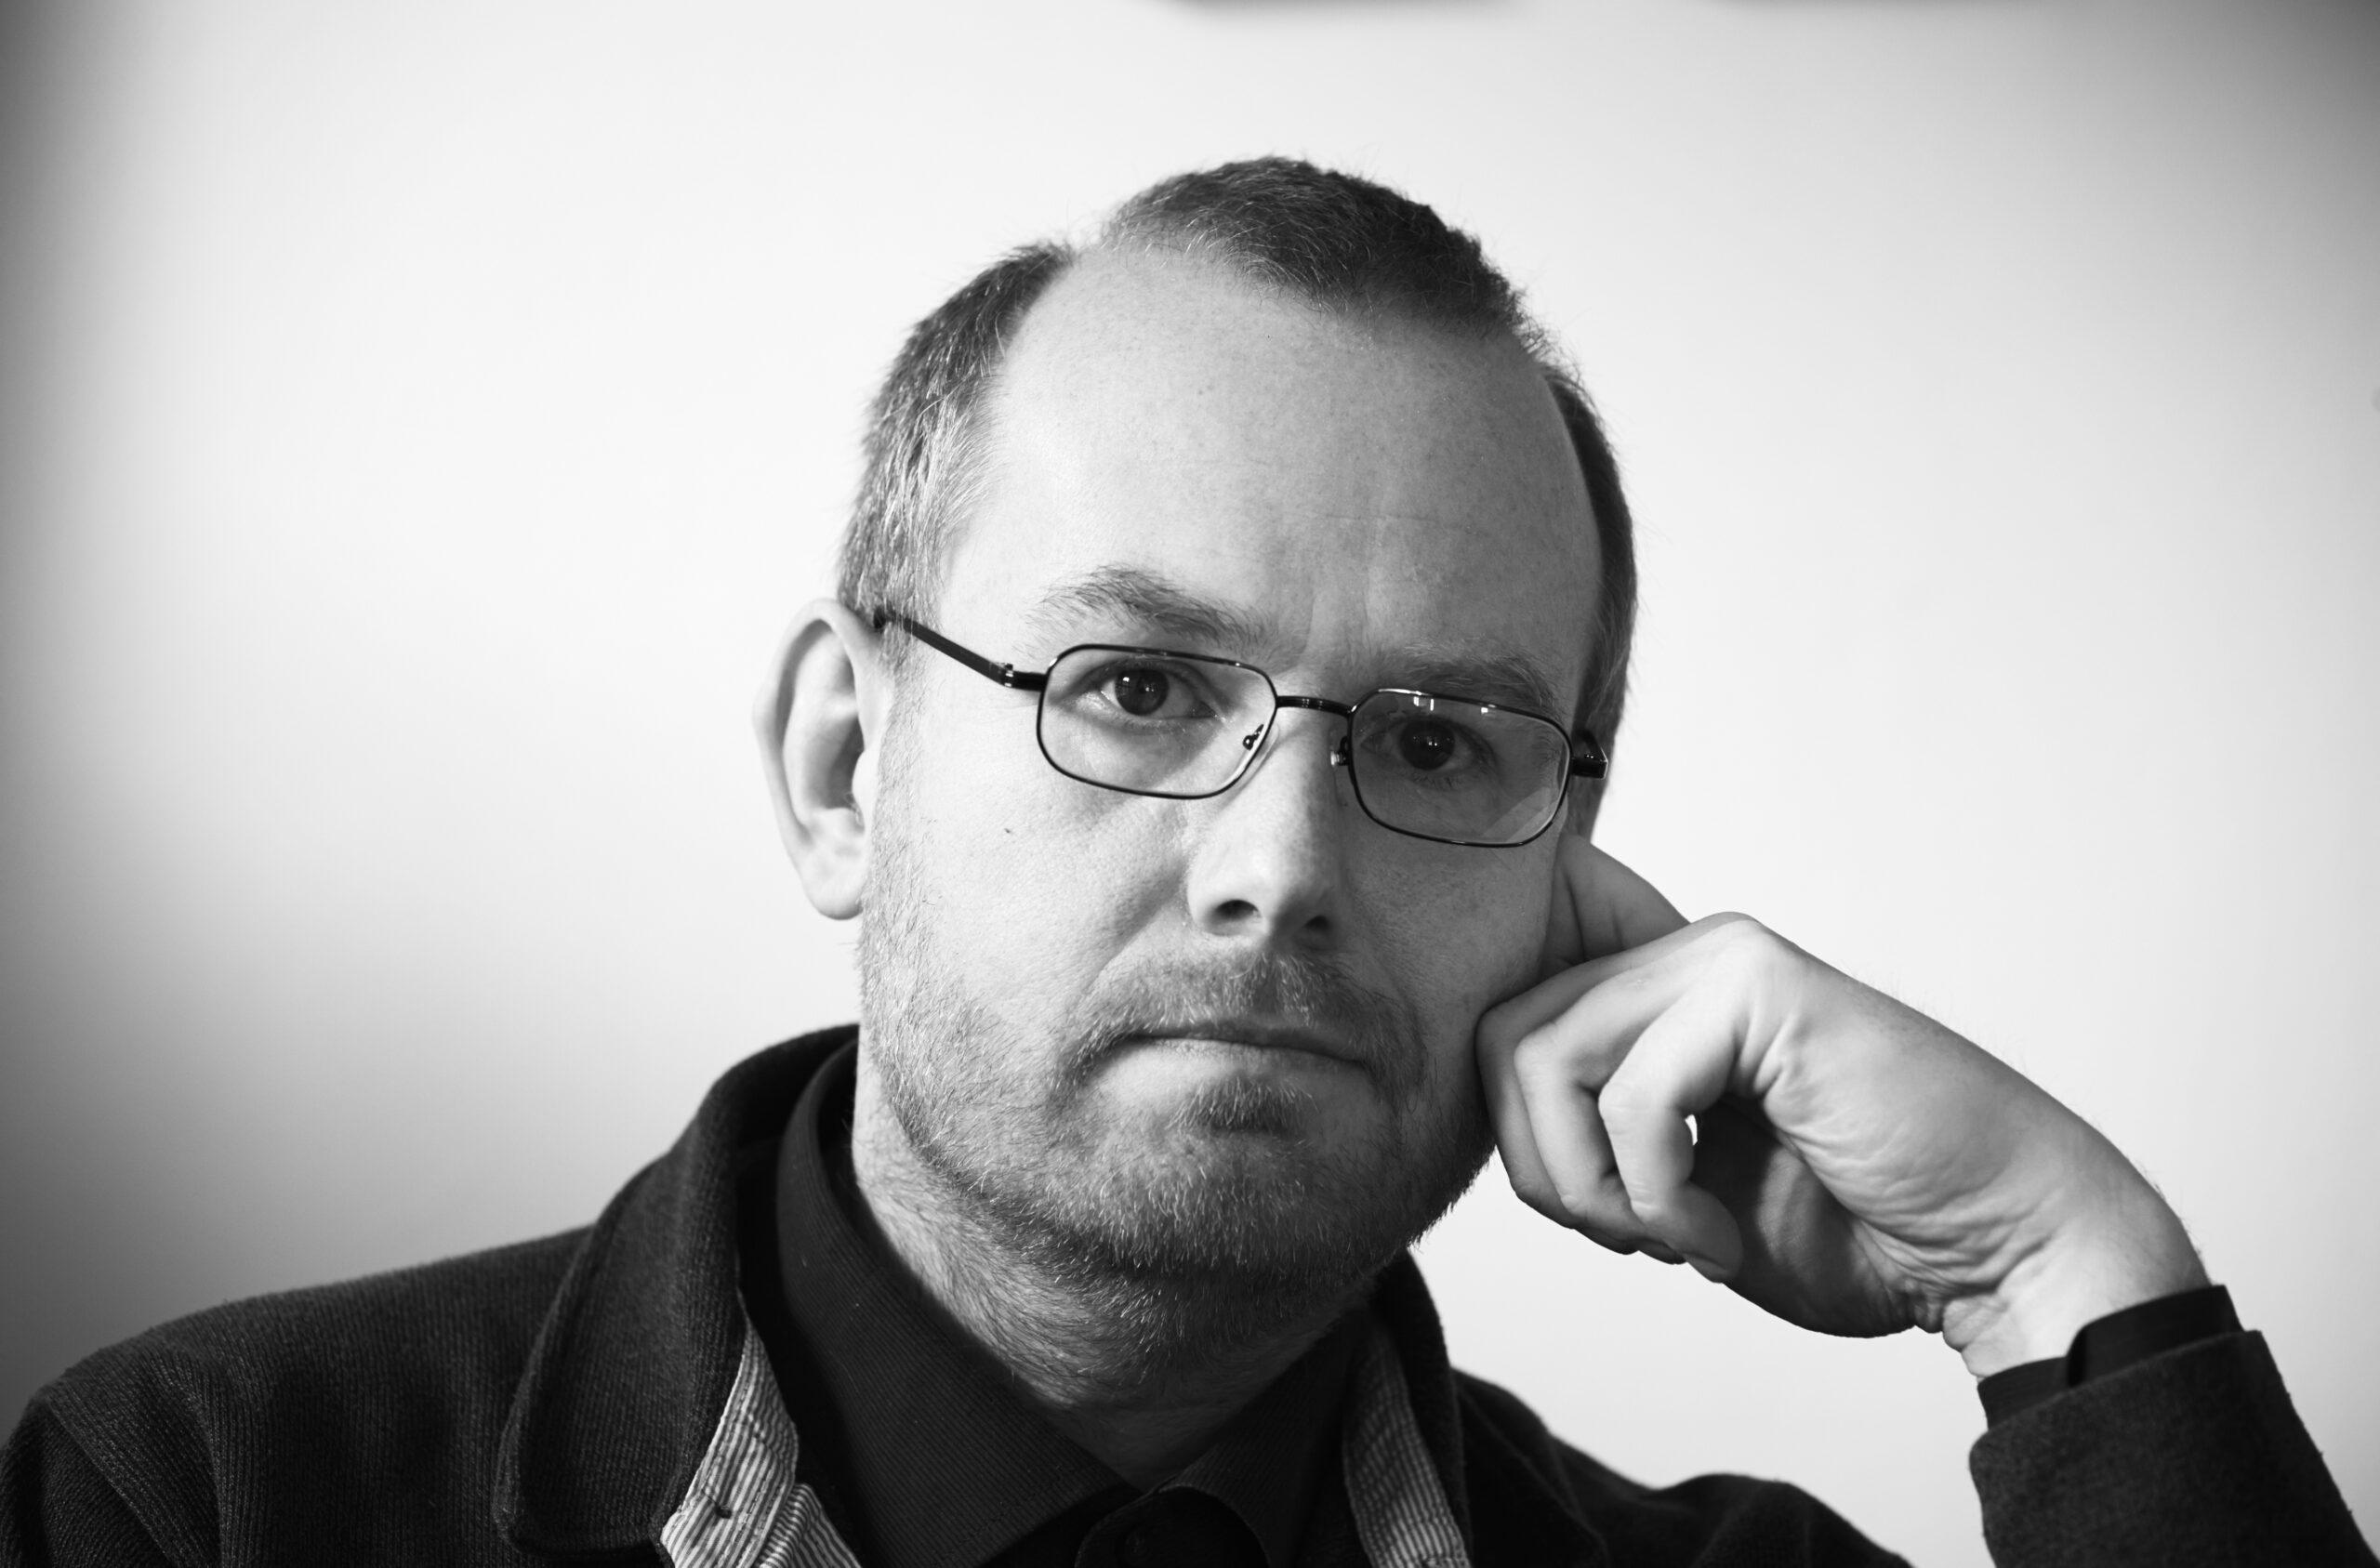 Billede af komponisten Thomas Agerfeldt Olesen